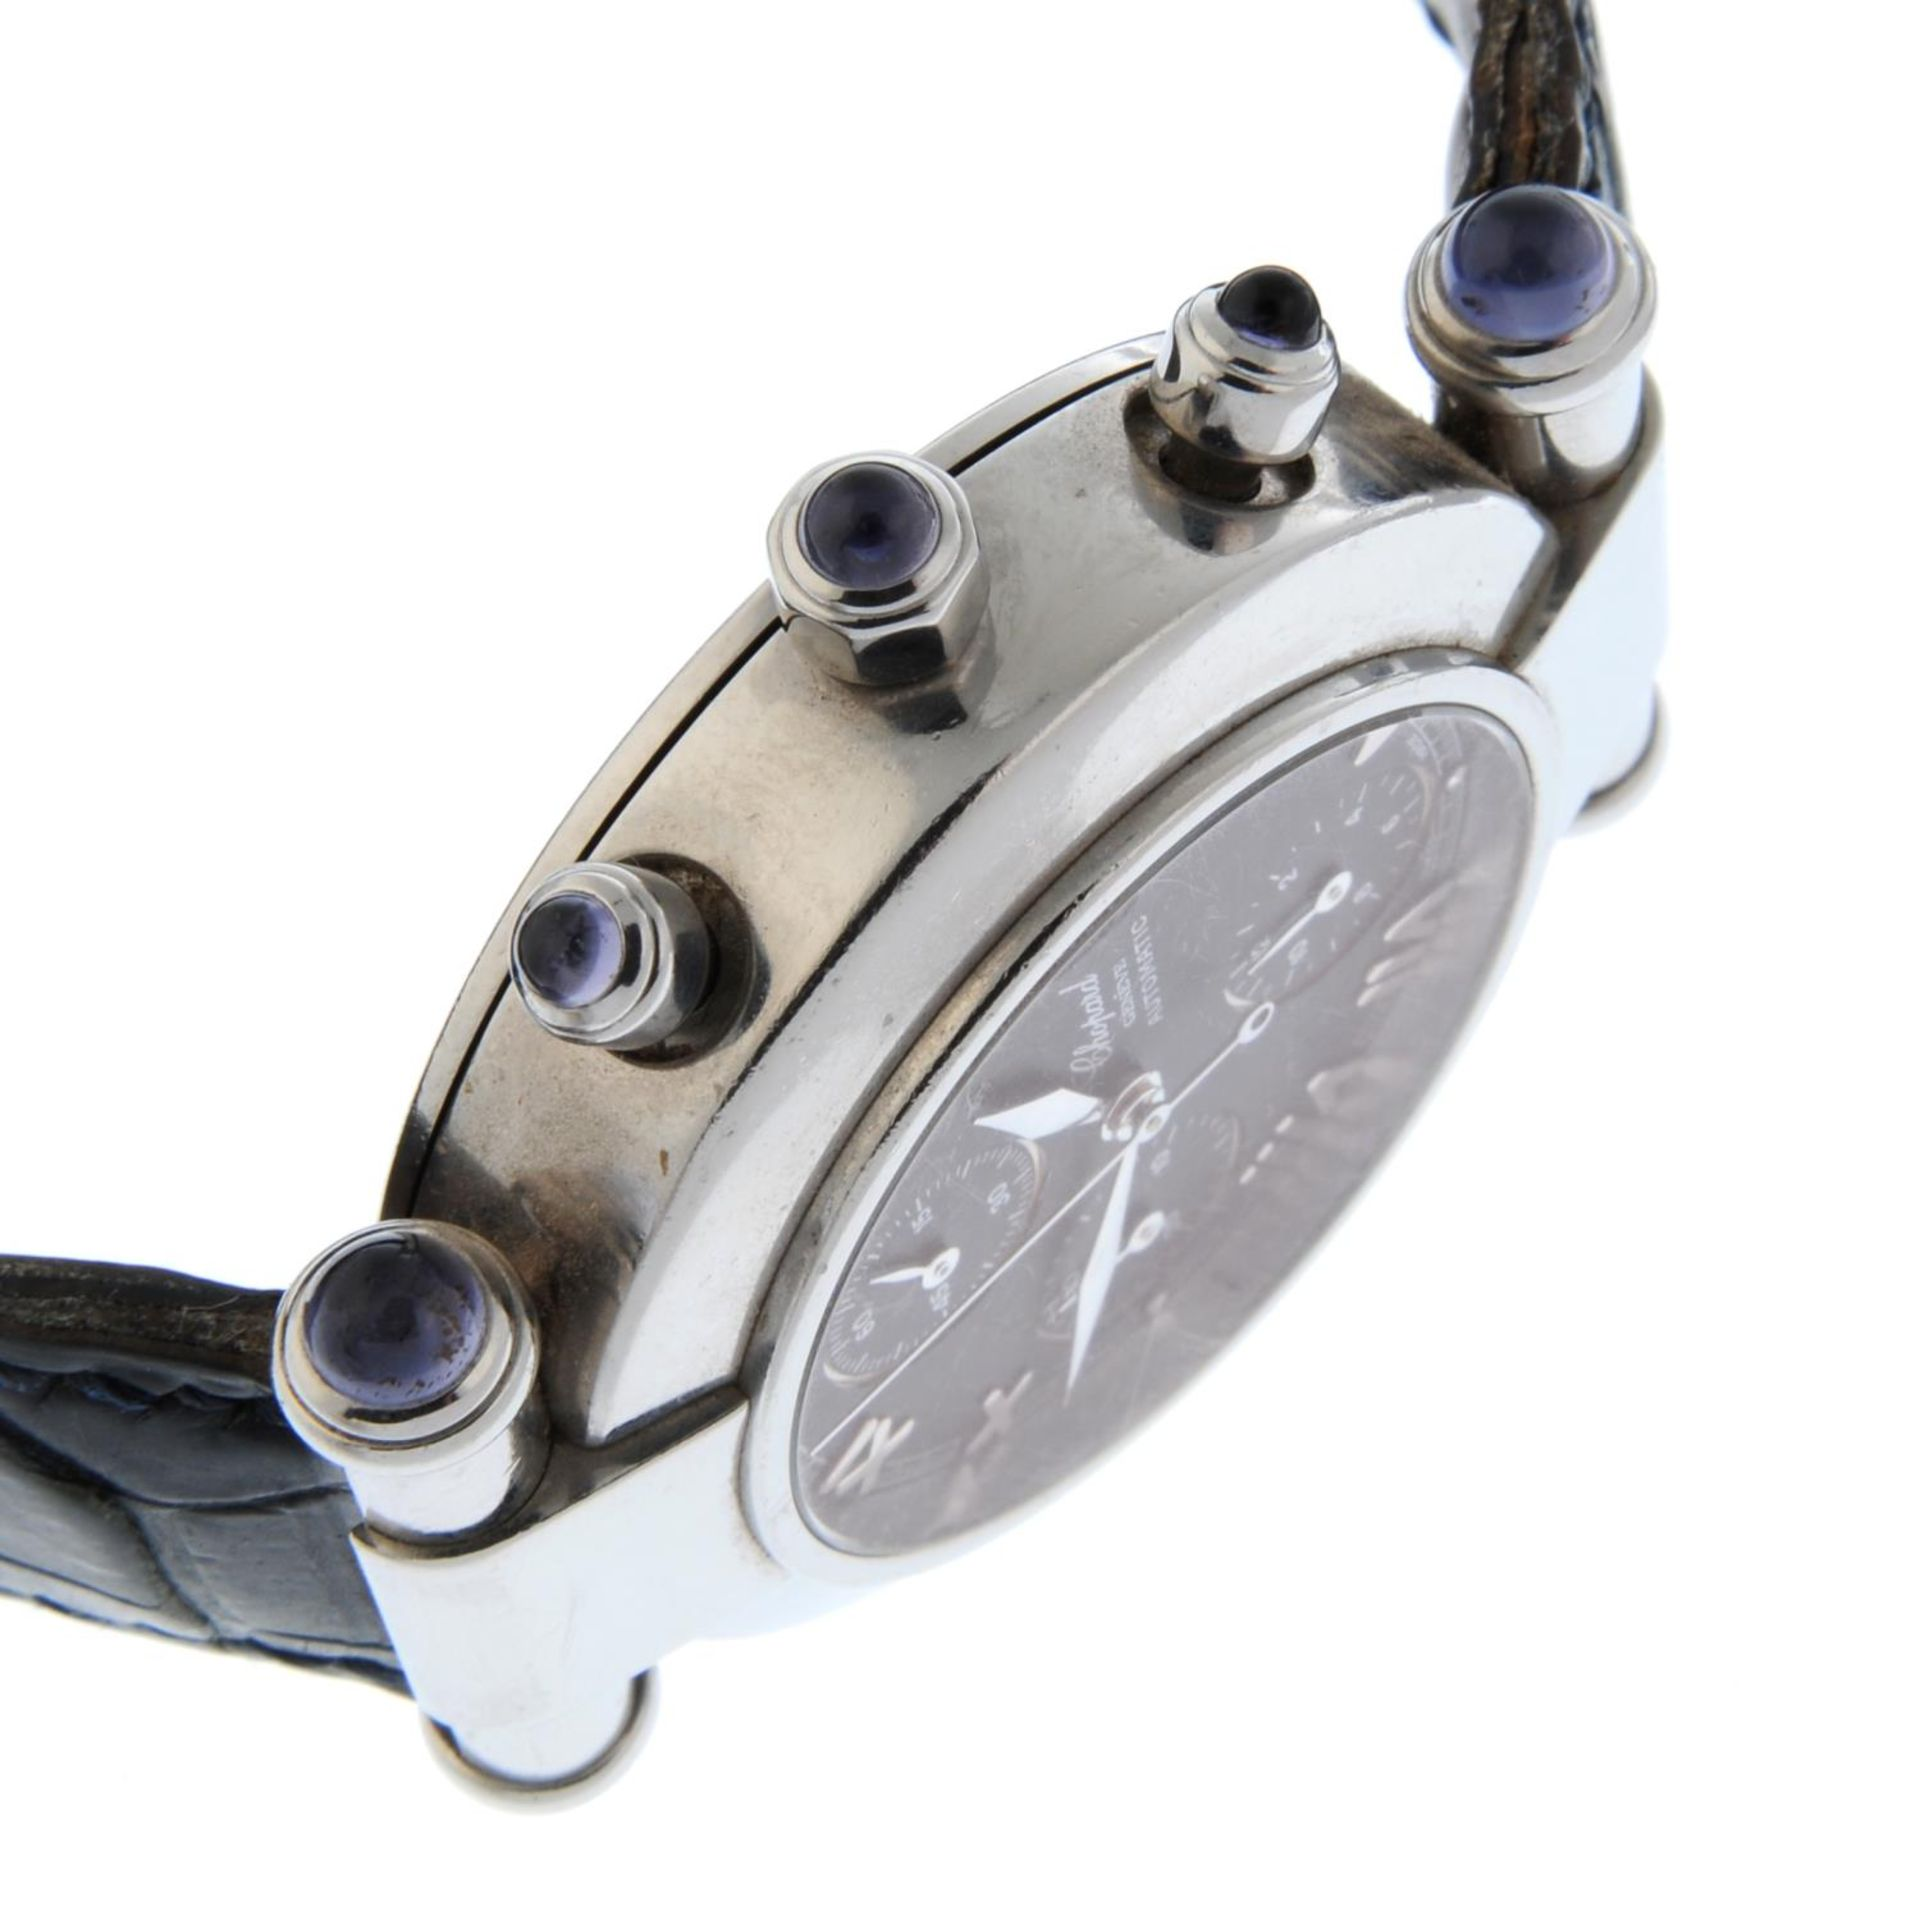 CHOPARD - an Imperiale chronograph wrist watch. - Bild 4 aus 5